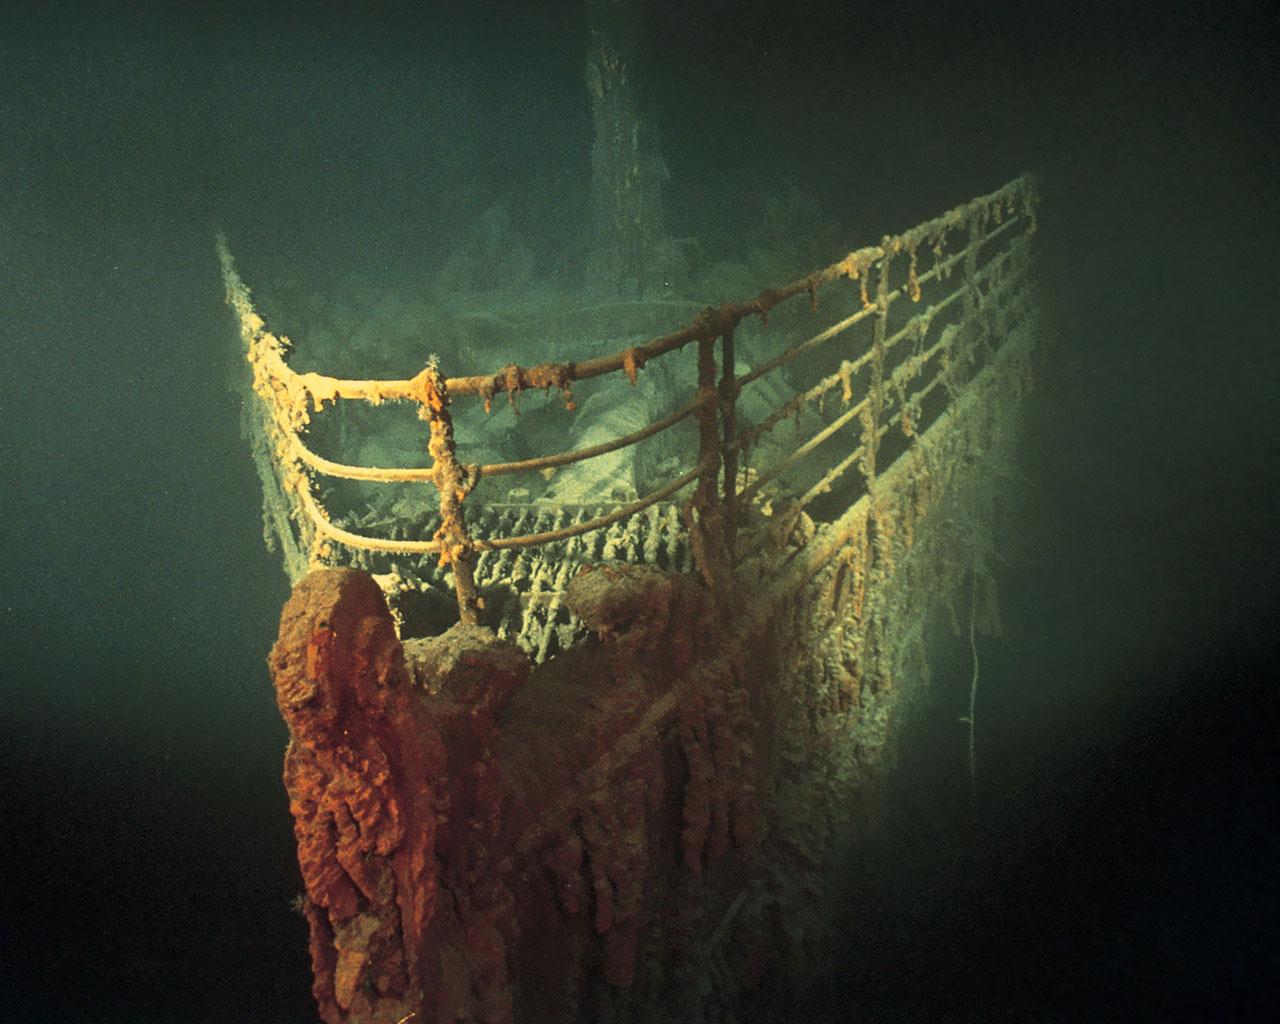 4k Wallpaper Ship Wreck